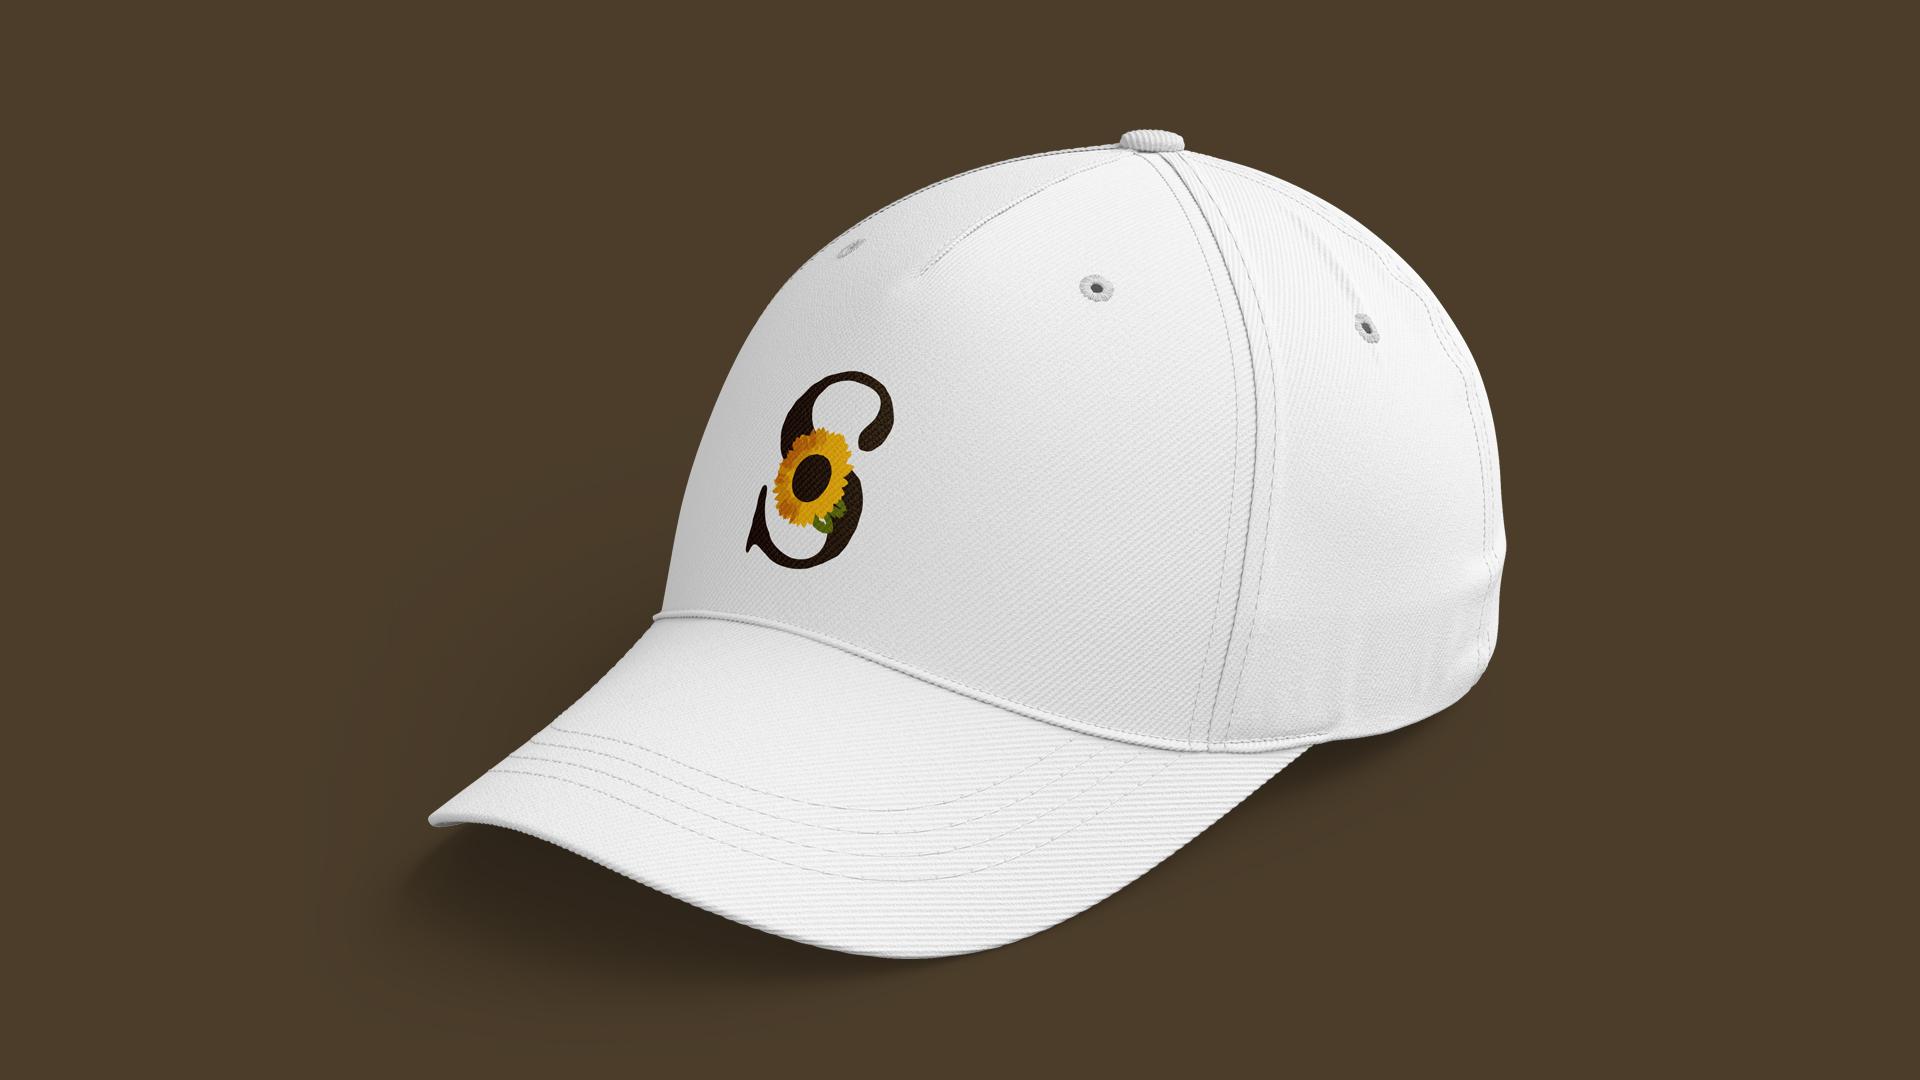 Wellness Brand Design secondary logo version on white cap